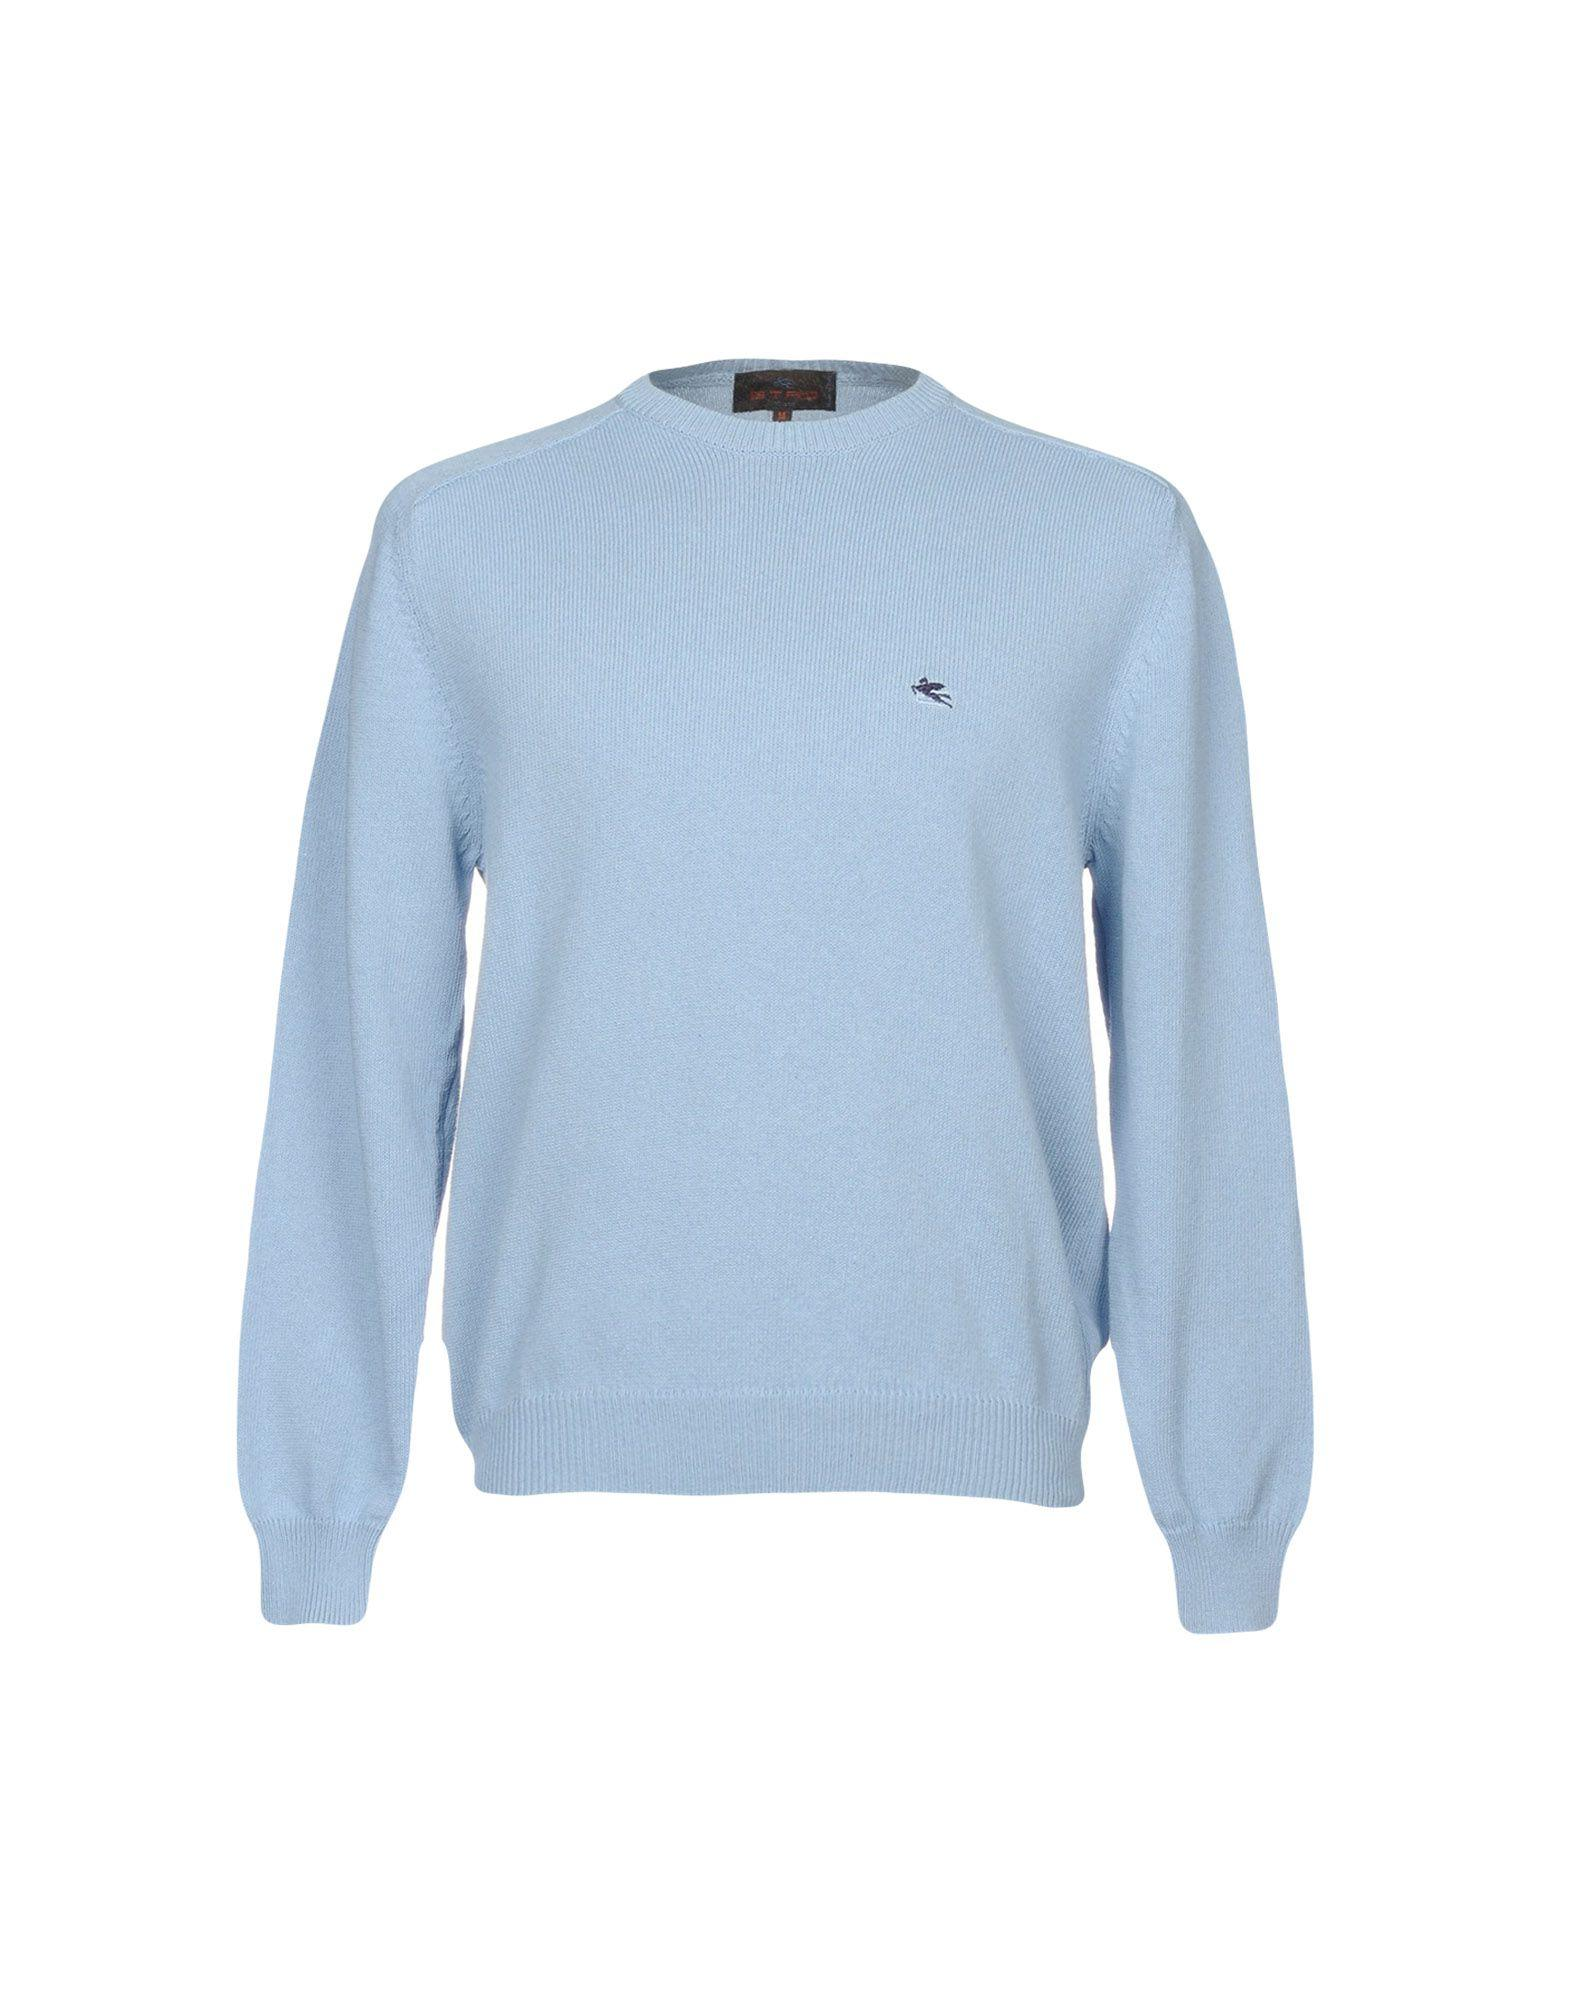 Etro Sweaters In Pastel Blue